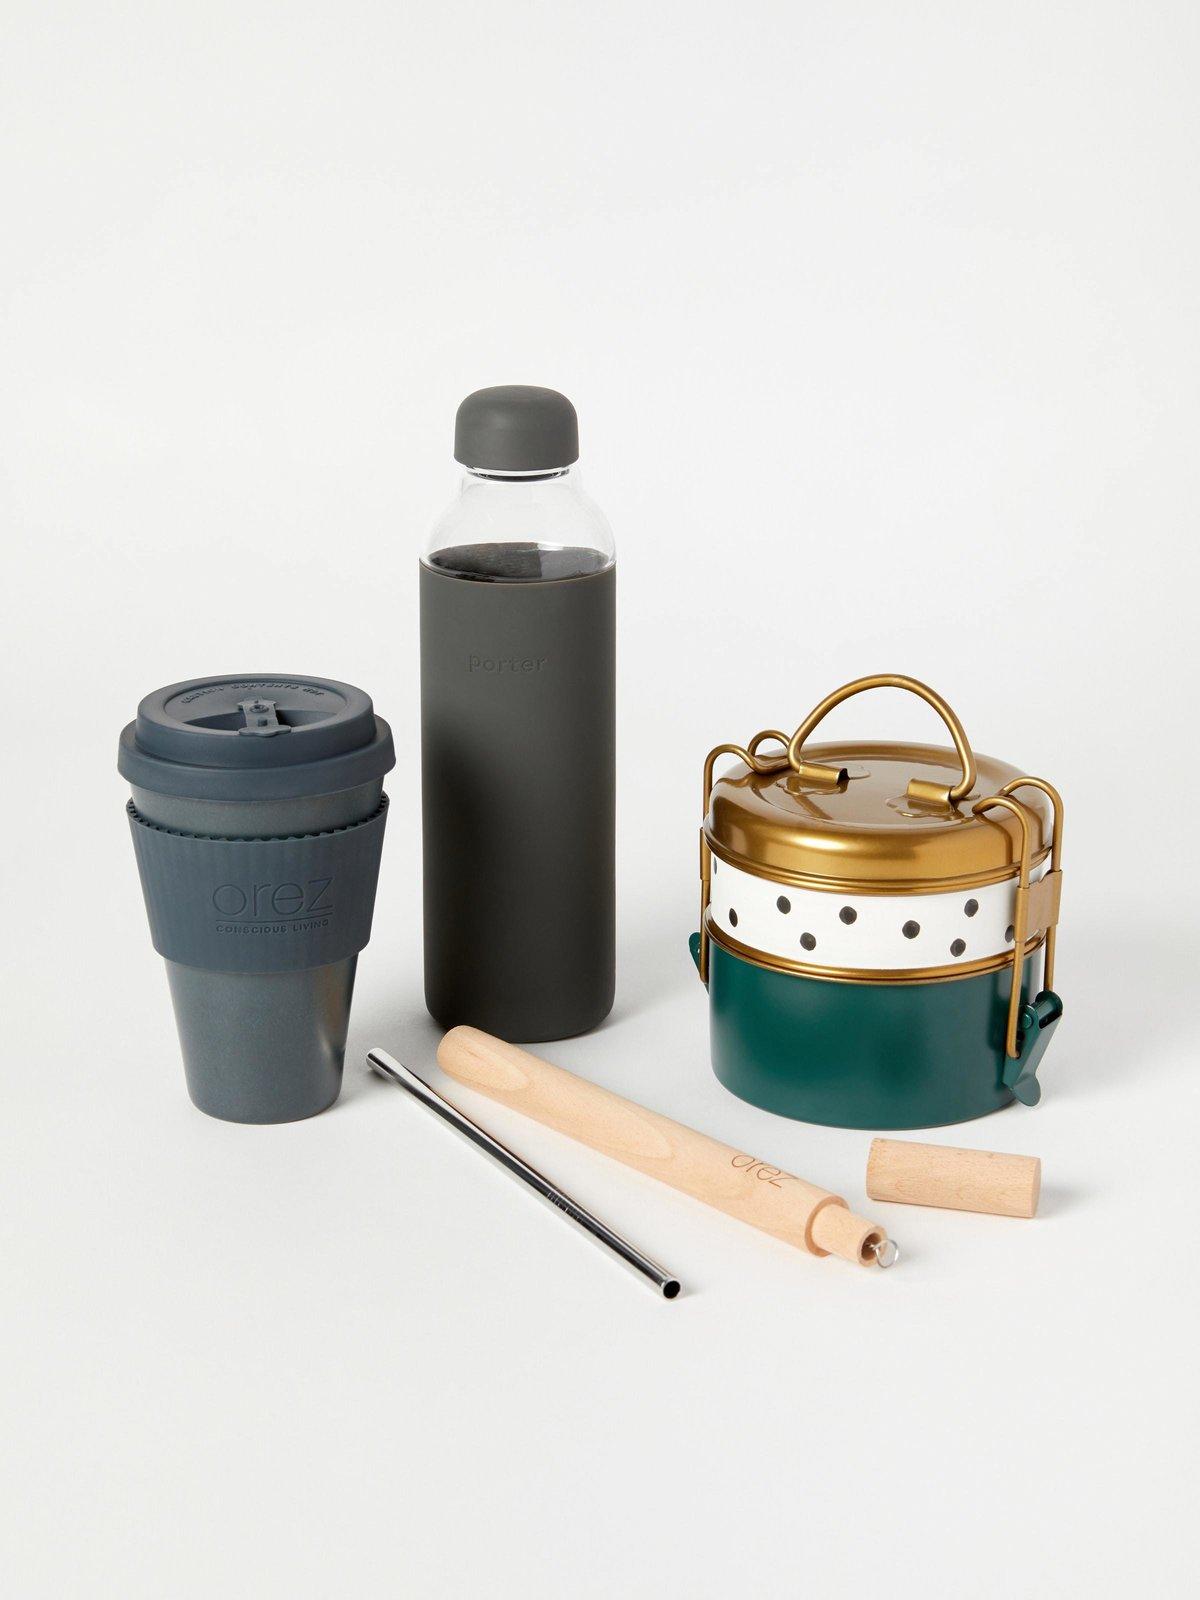 Verishop the Eco Gift Bundle